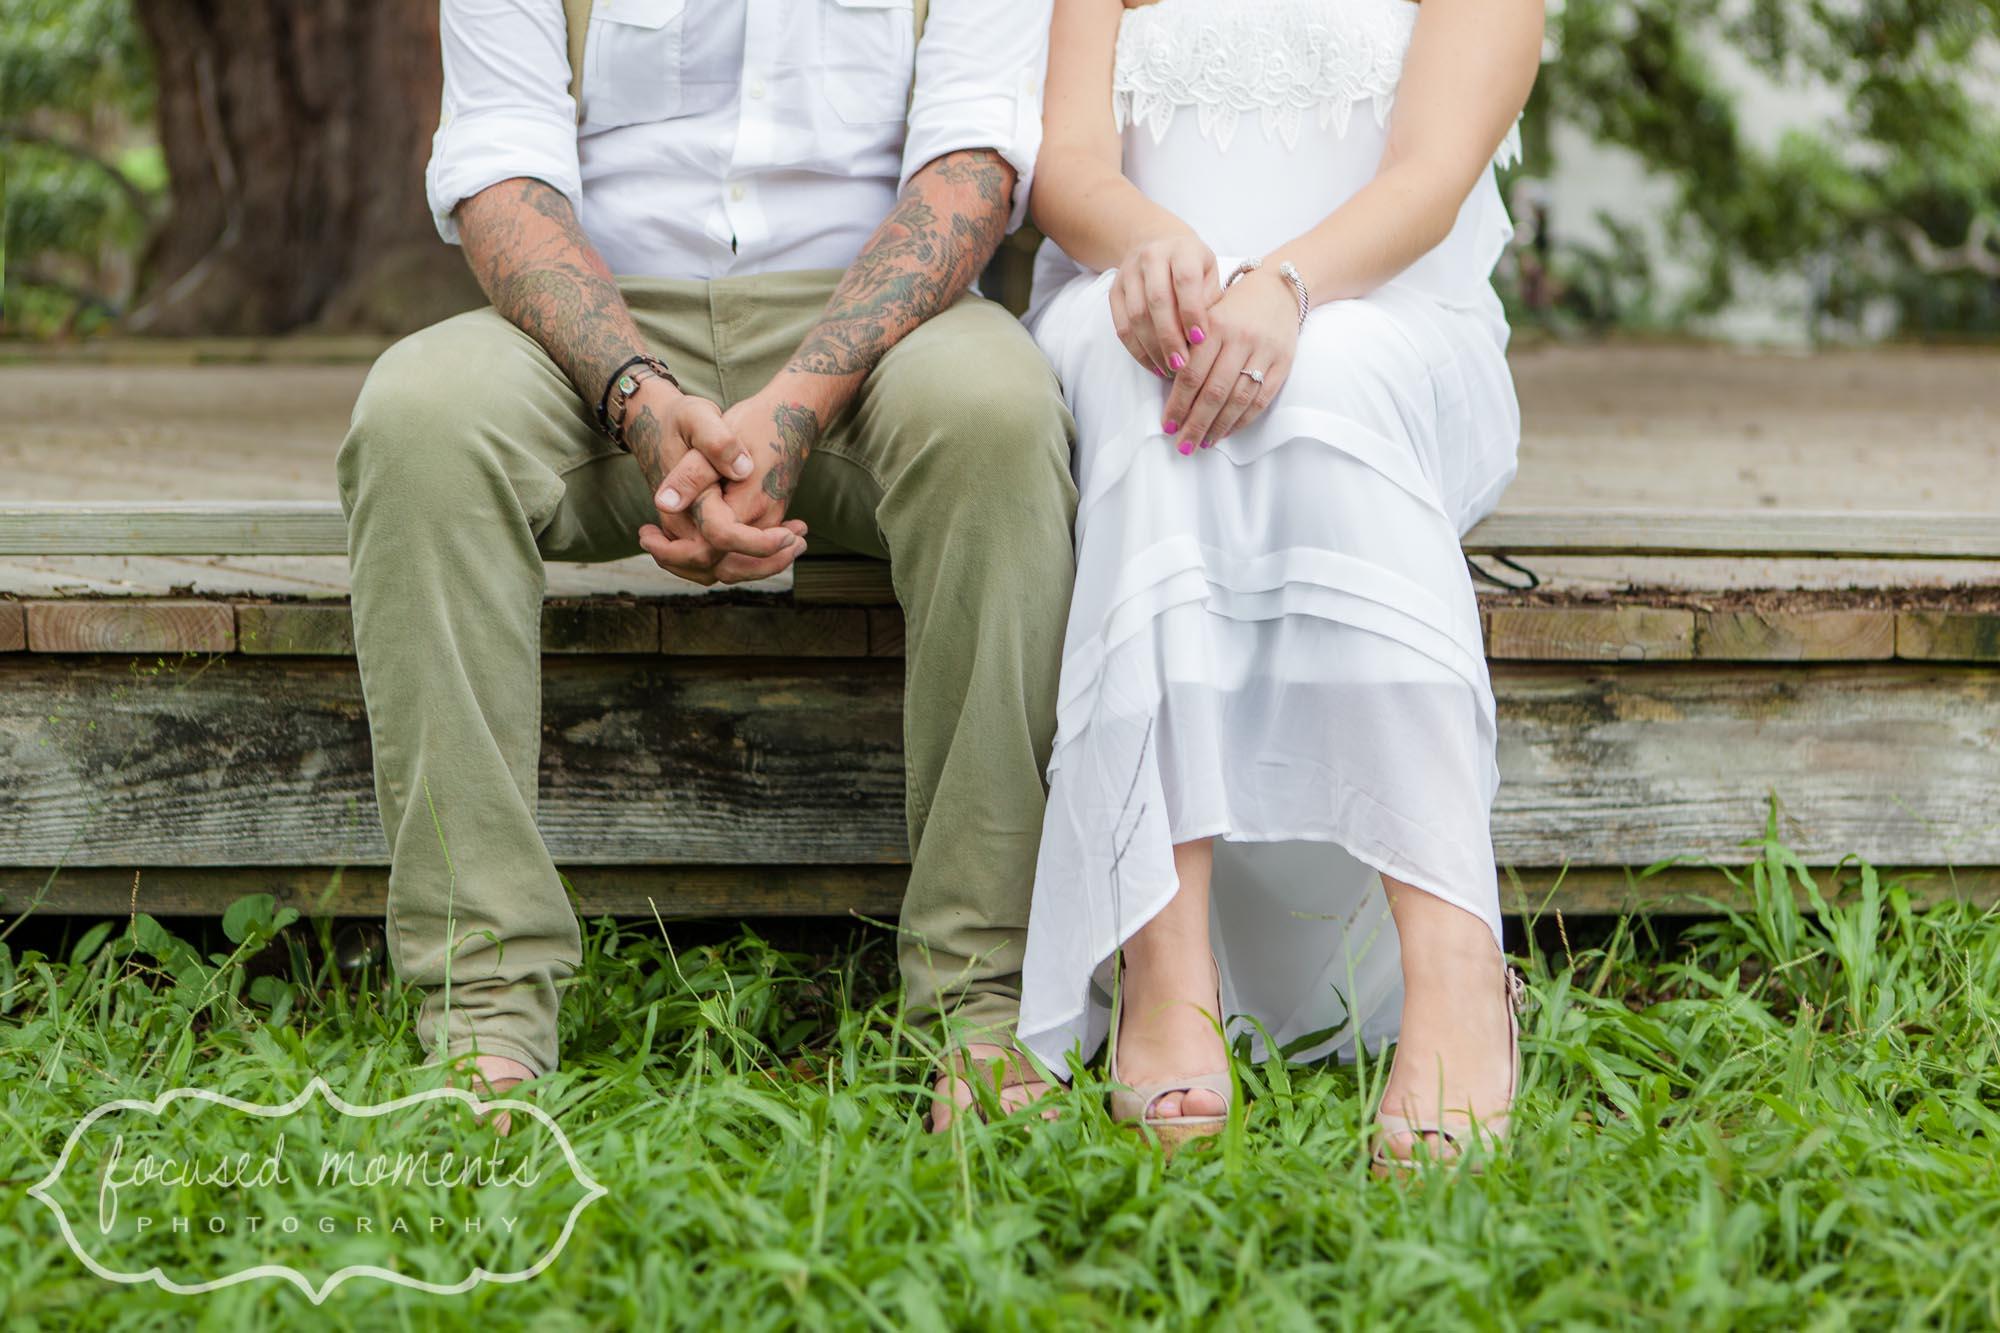 2013_08_03_Treaty_Oaks_Park_Jacksonville_Engagement_Photography_18.jpg